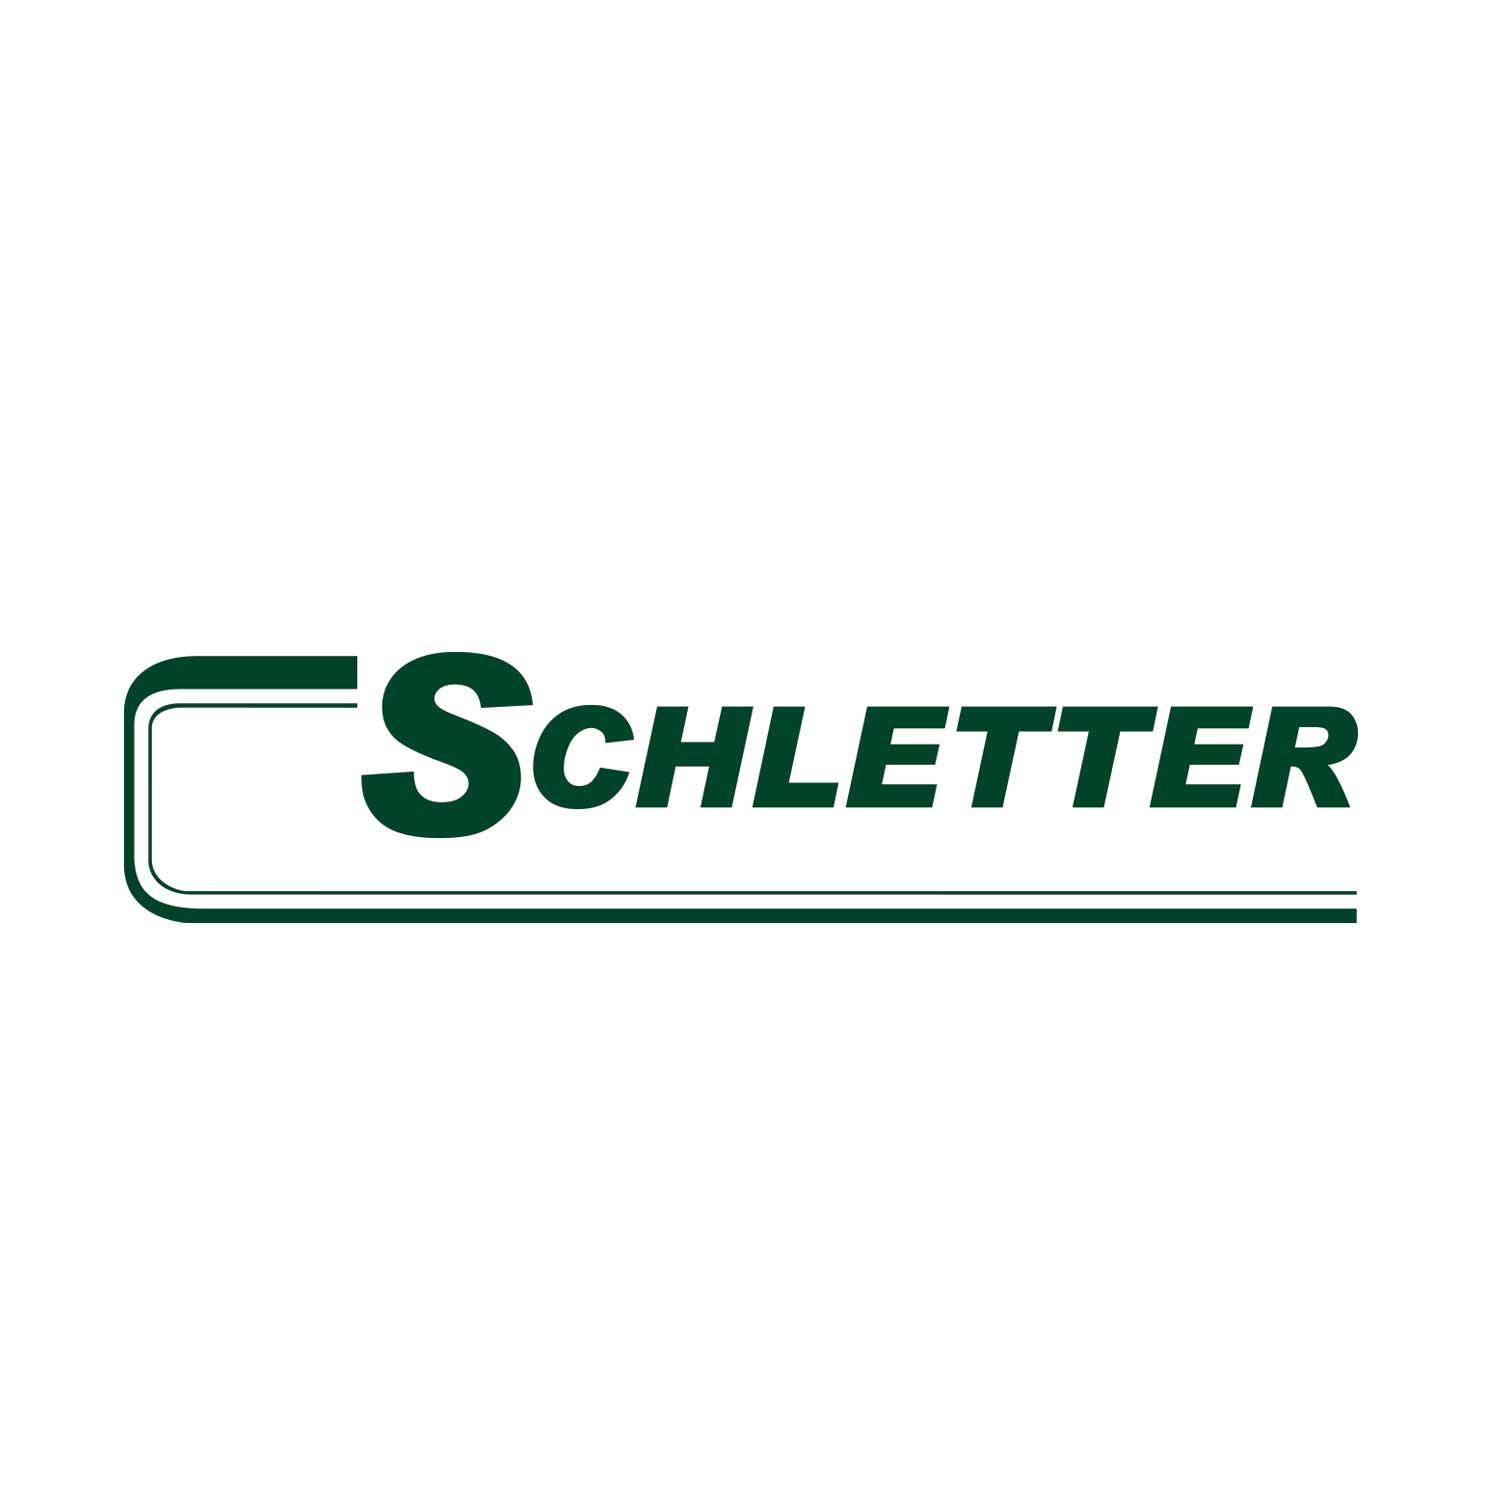 Schletter2_OV.jpg